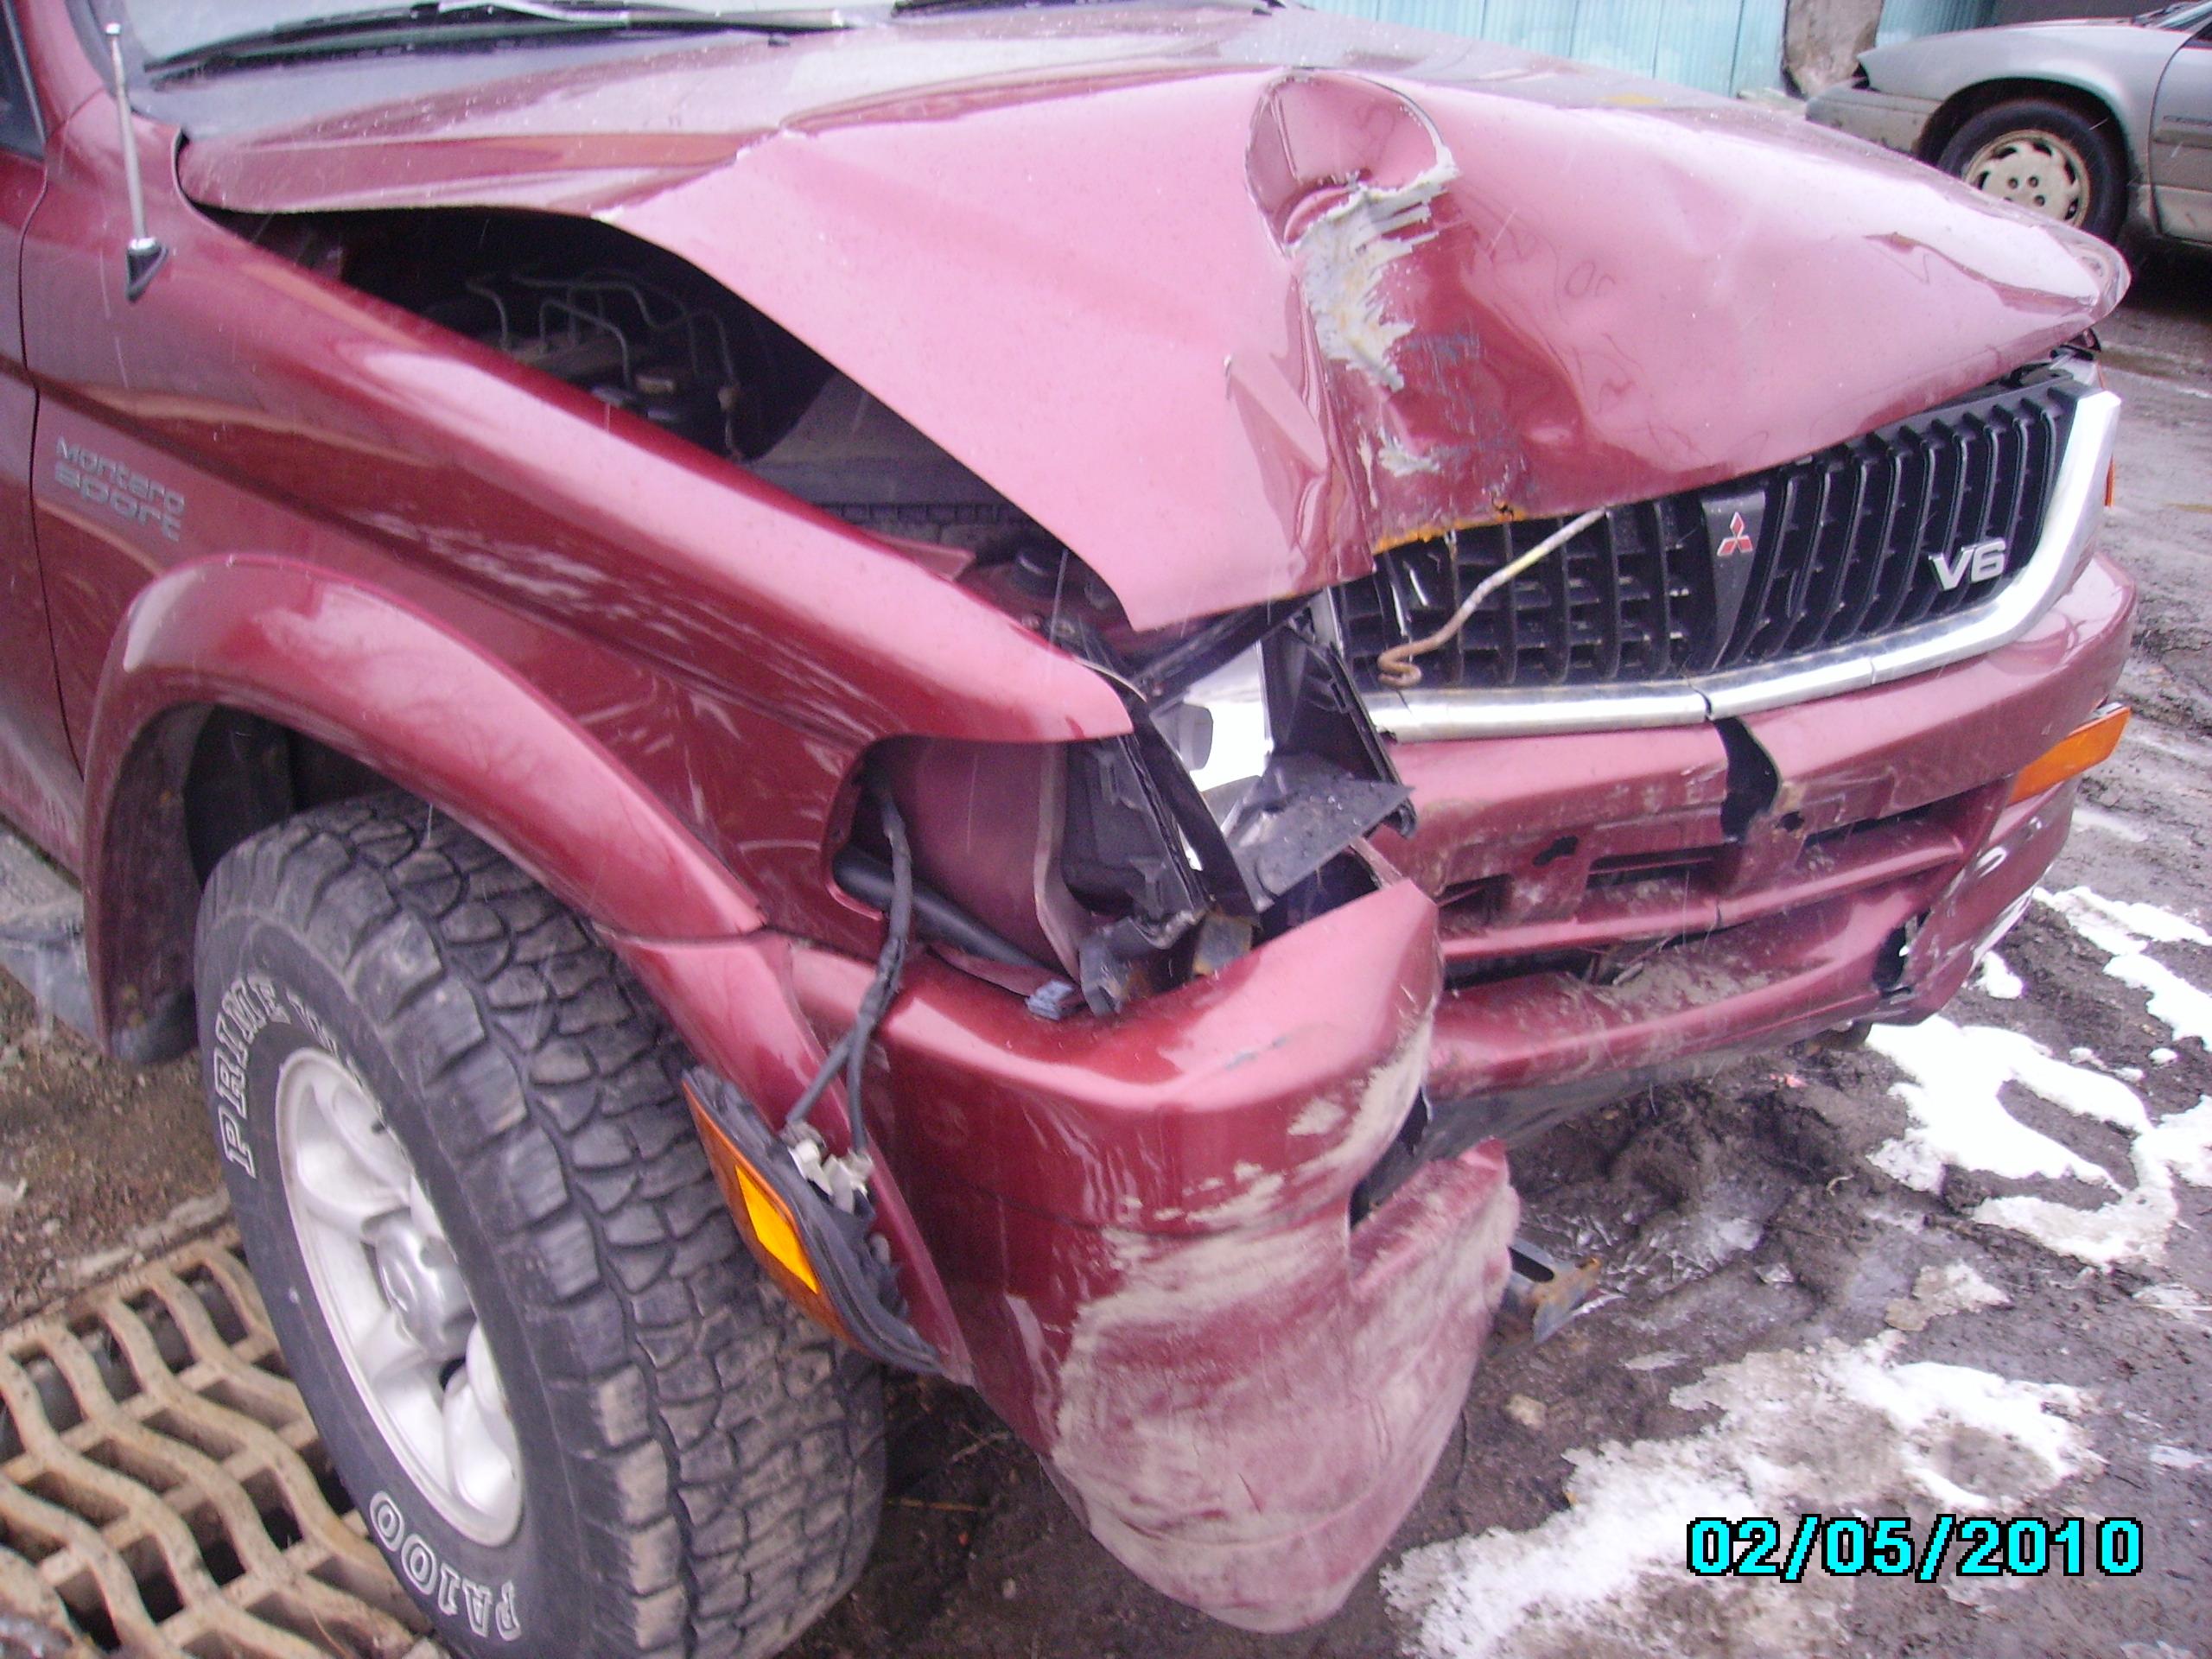 123529 1987 Dodge Raider Mitsubishi Montero Rare 2 Door Runs Excellent No Reserve likewise 315805610 1997 Mitsubishi Monterosport in addition 1991 Jeep Wrangler also 440 58818c Rear Axle 4x2 3 0l 6 Cyl 4 90 Ratio Non Locking moreover 031710. on salvage mitsubishi montero